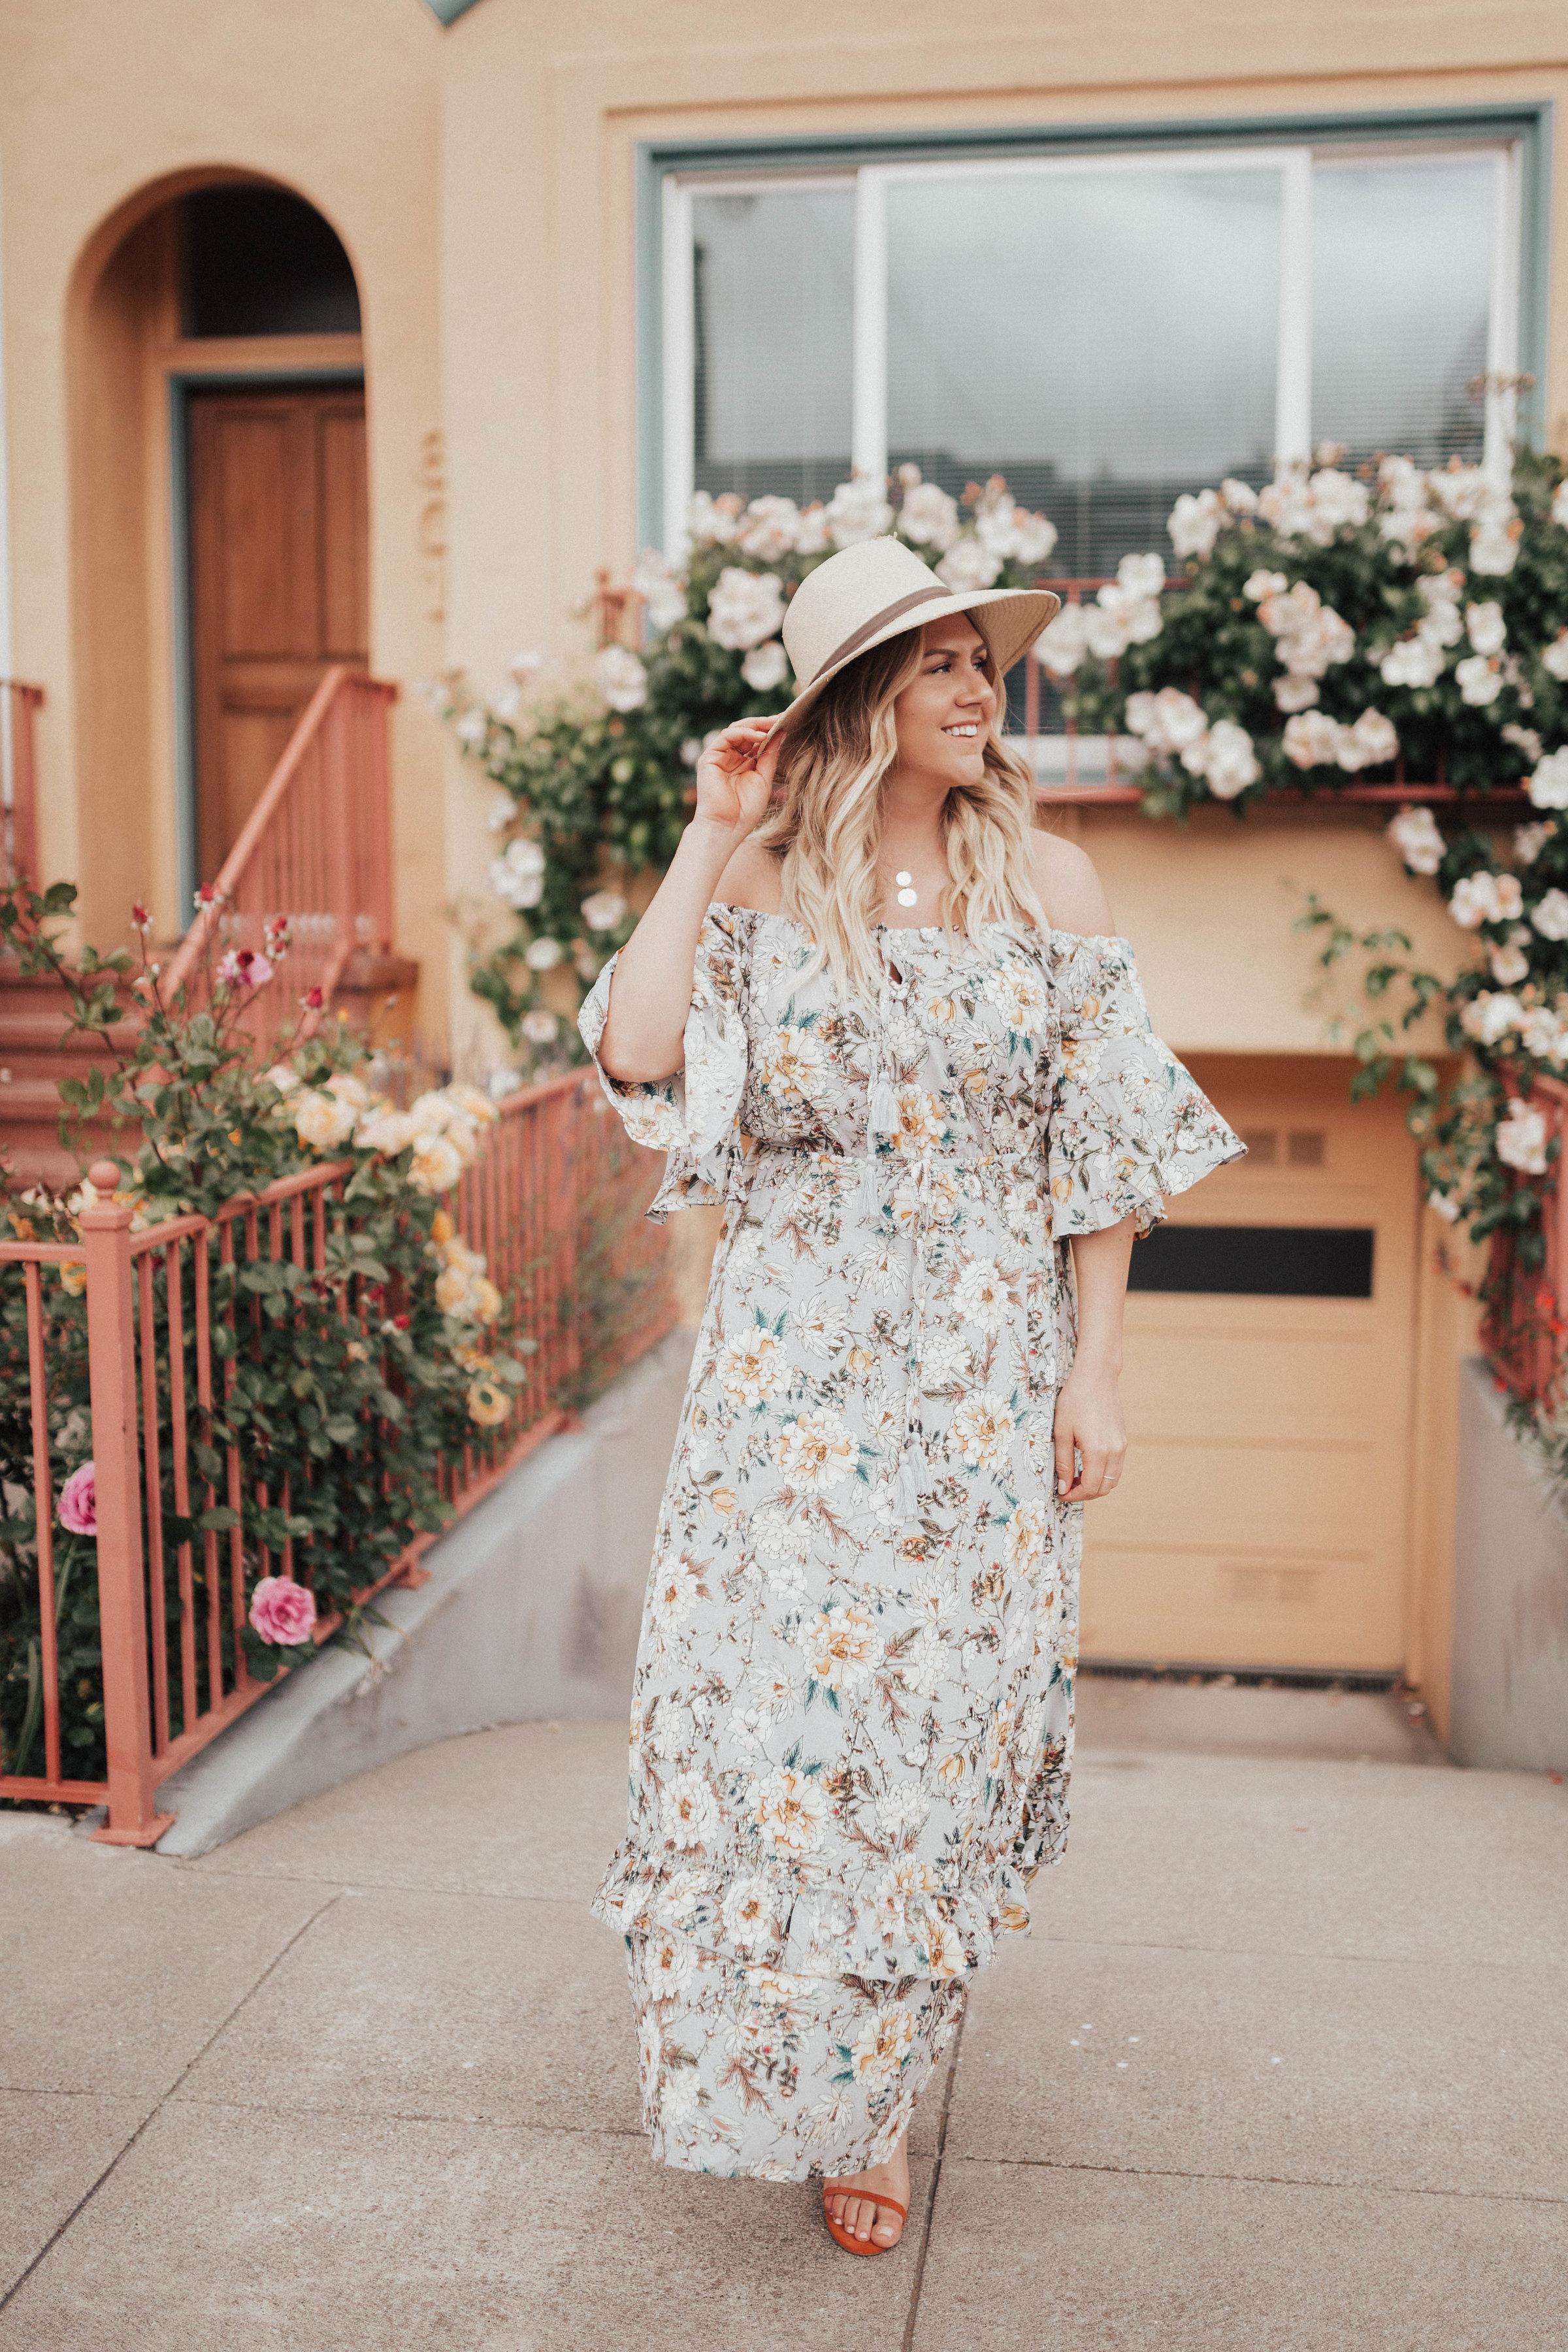 via thea floral dress under $25 janessa leone hat, matisse sandals, serefina necklace & earrings